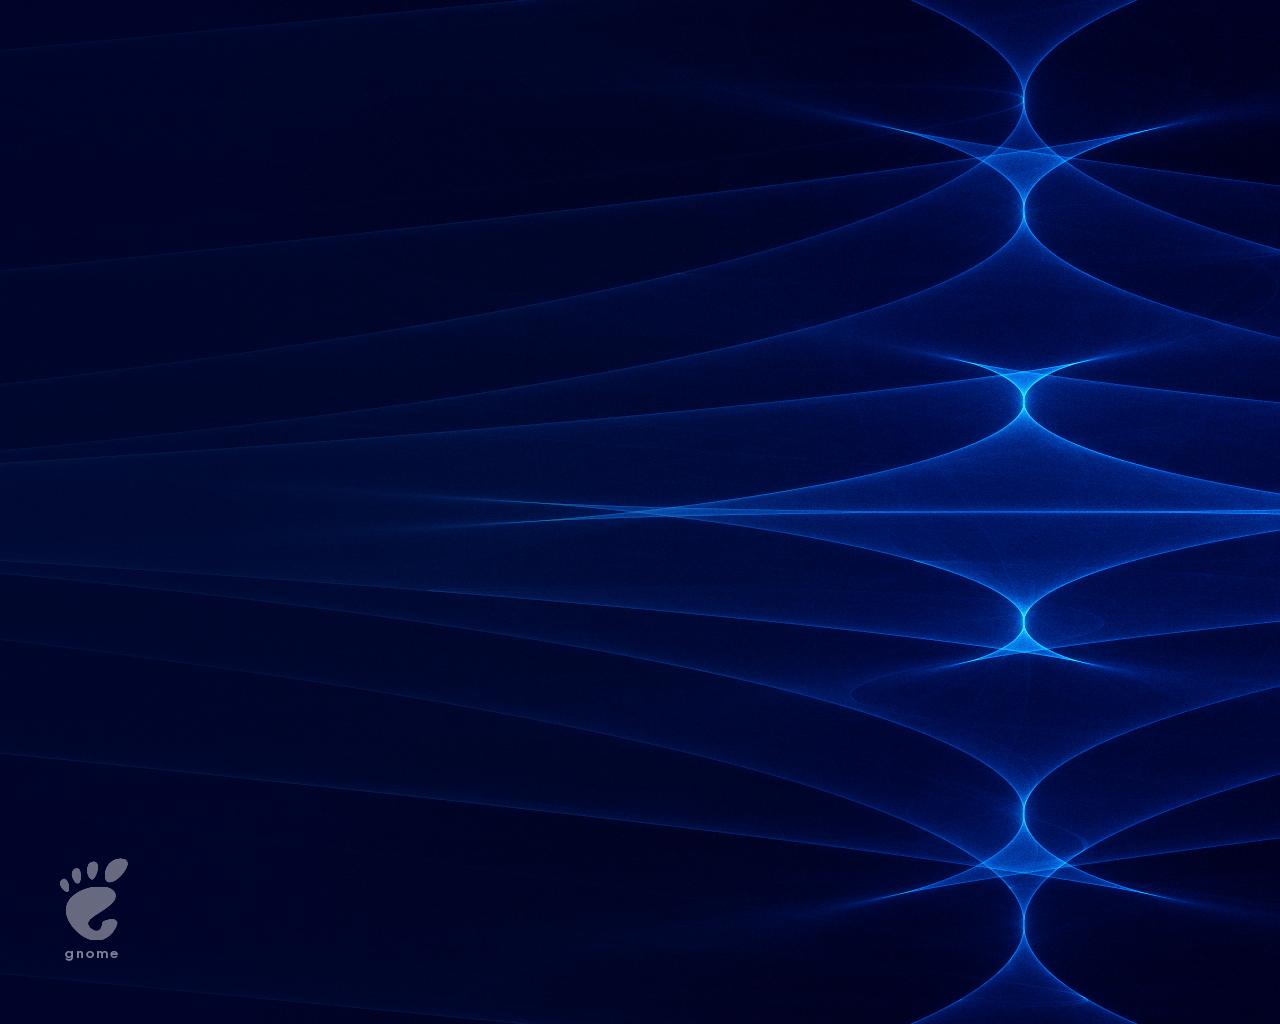 Electric Blue wallpaper 27336 1280x1024